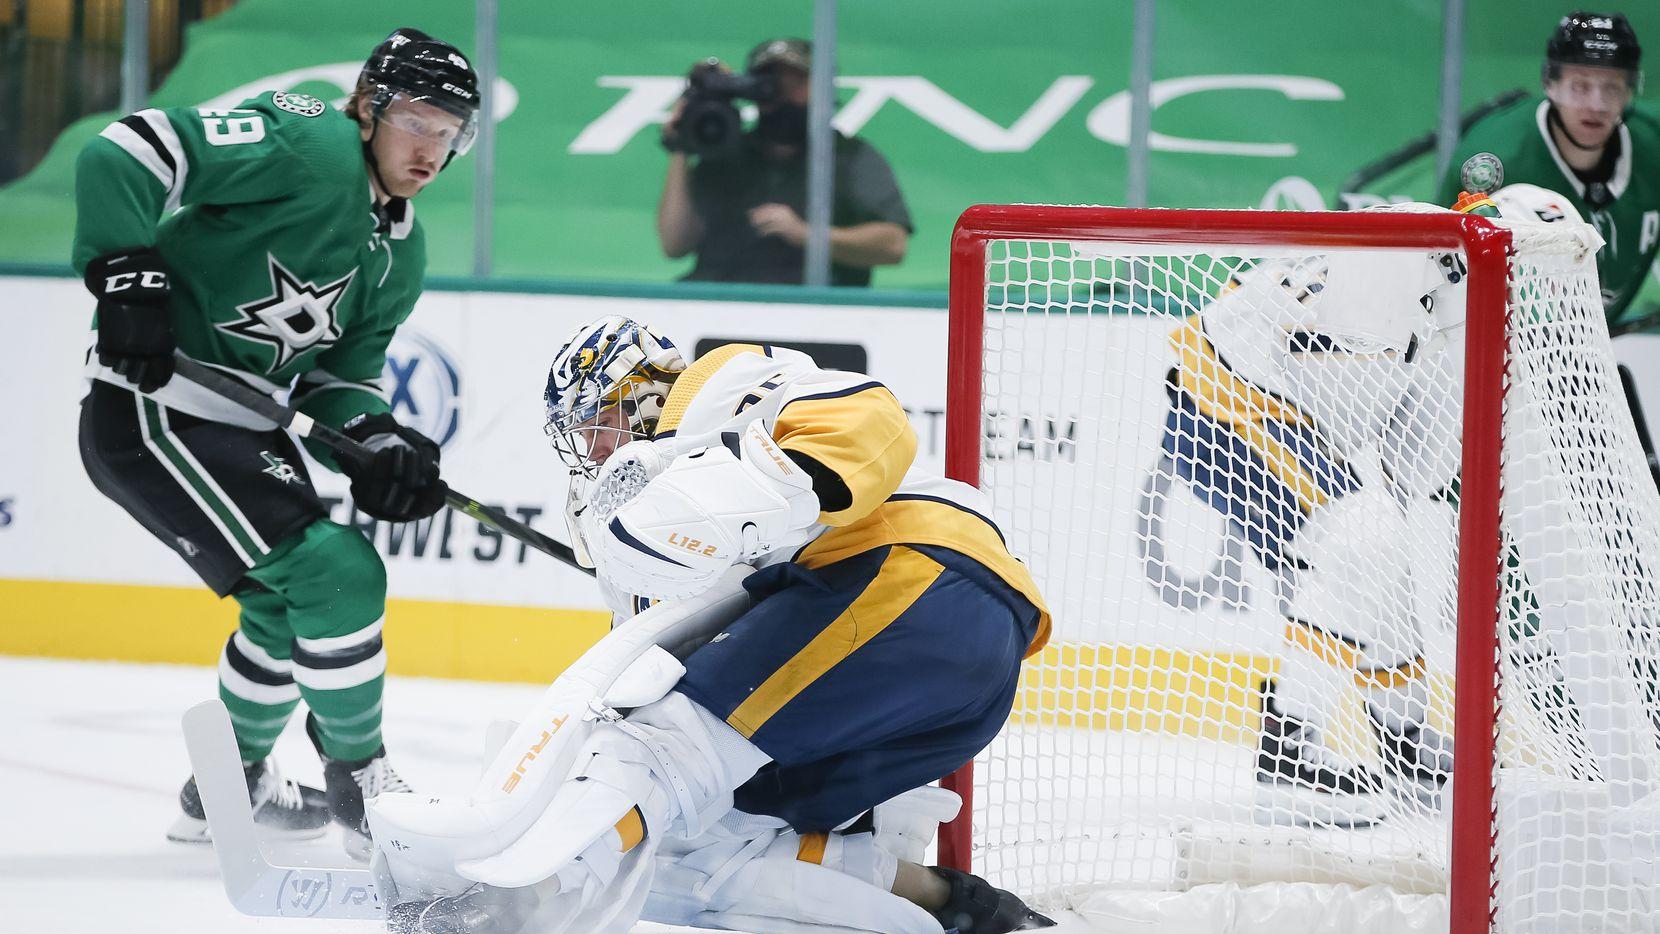 Dallas Stars forward Rhett Gardner (49) scores a goal against Nashville Predators goaltender Pekka Rinne (35) during the first period of an NHL hockey game in Dallas Sunday, March 21, 2021.